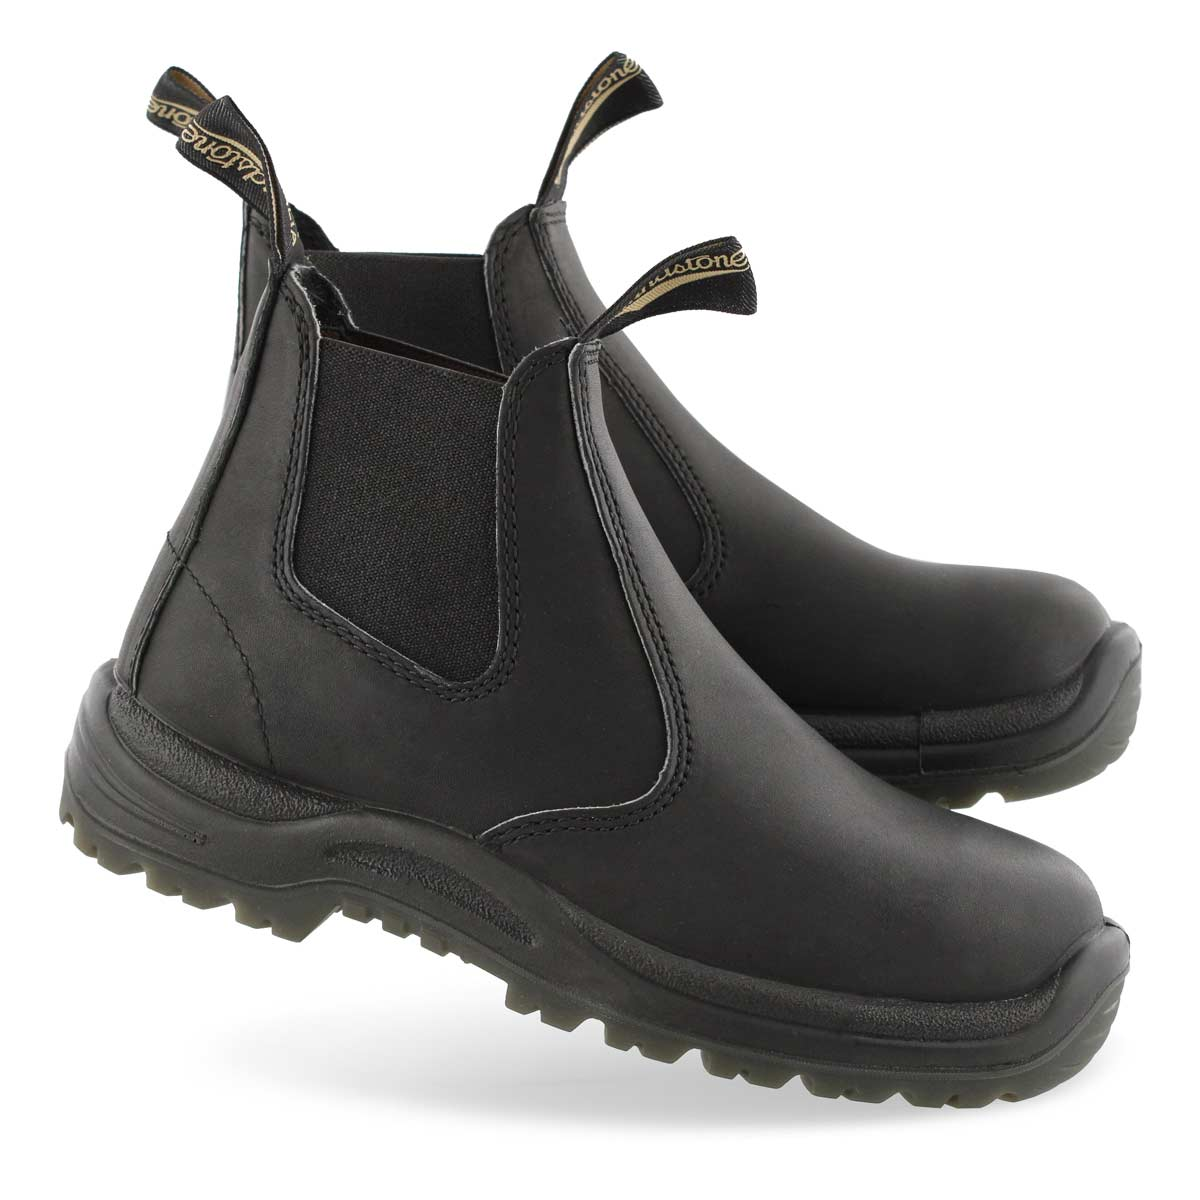 Unisex Chunk 2 black twin gore boot